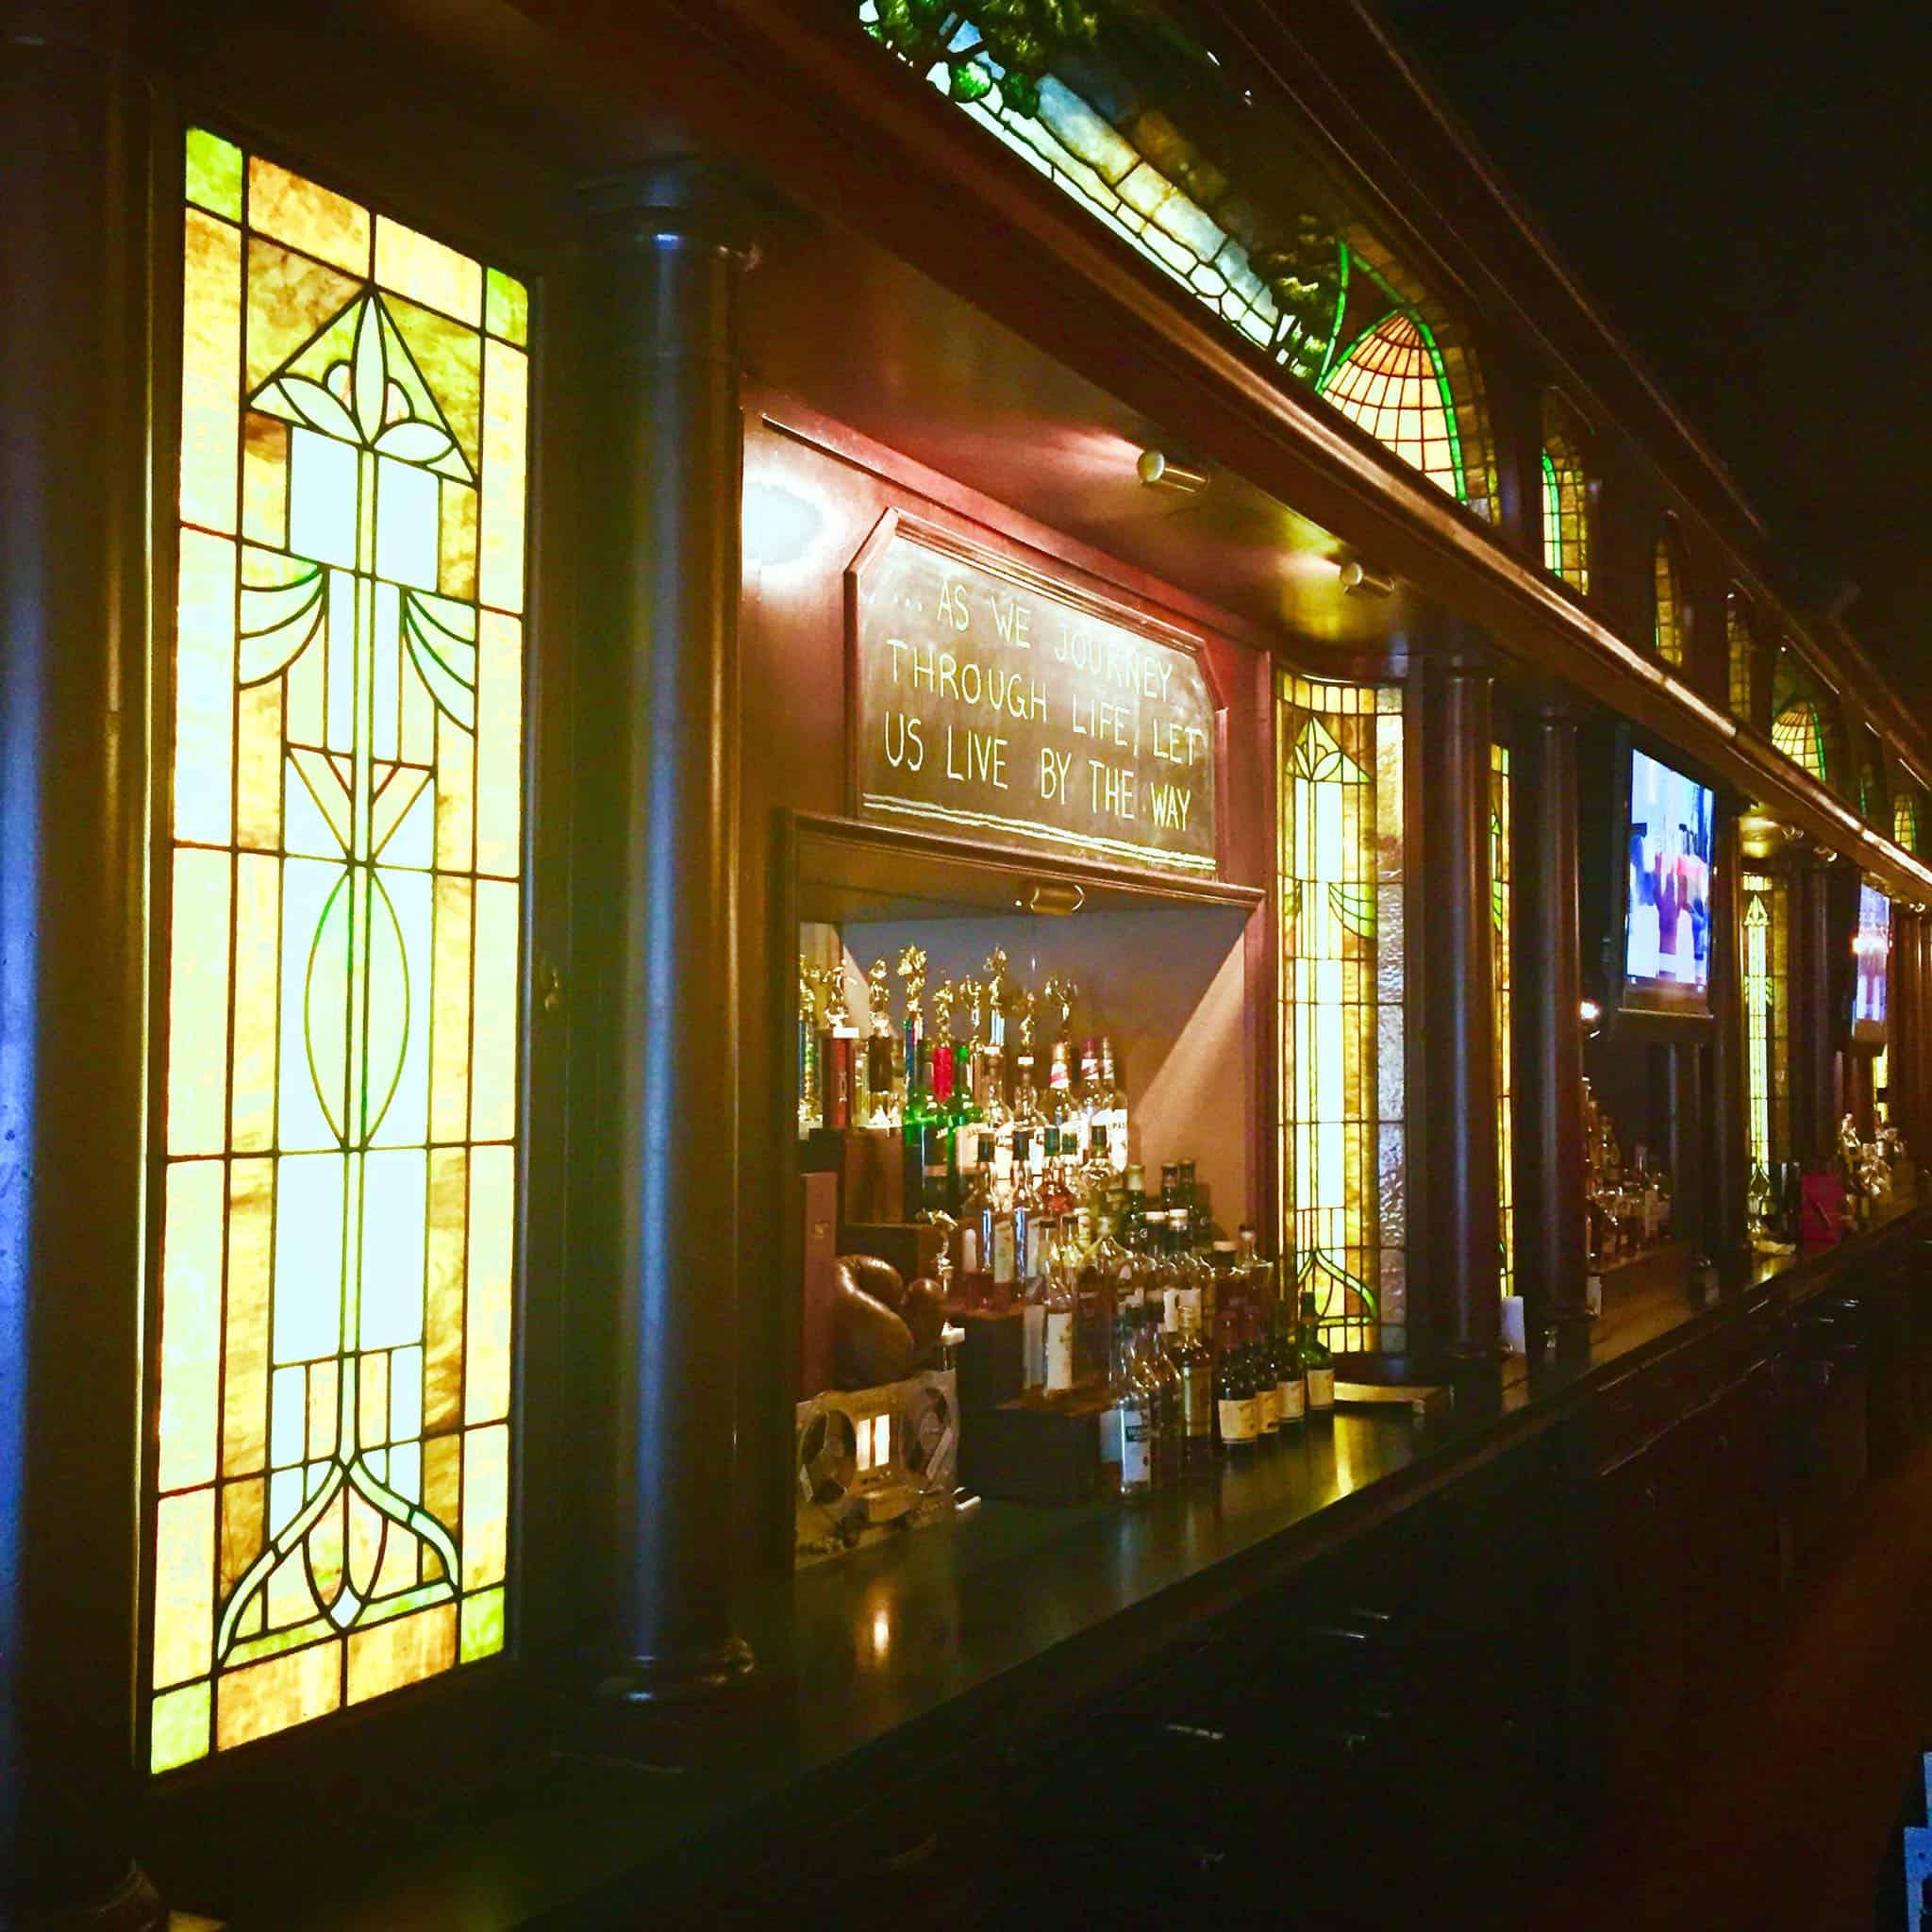 Dan Kelly's Pub (coming soon)